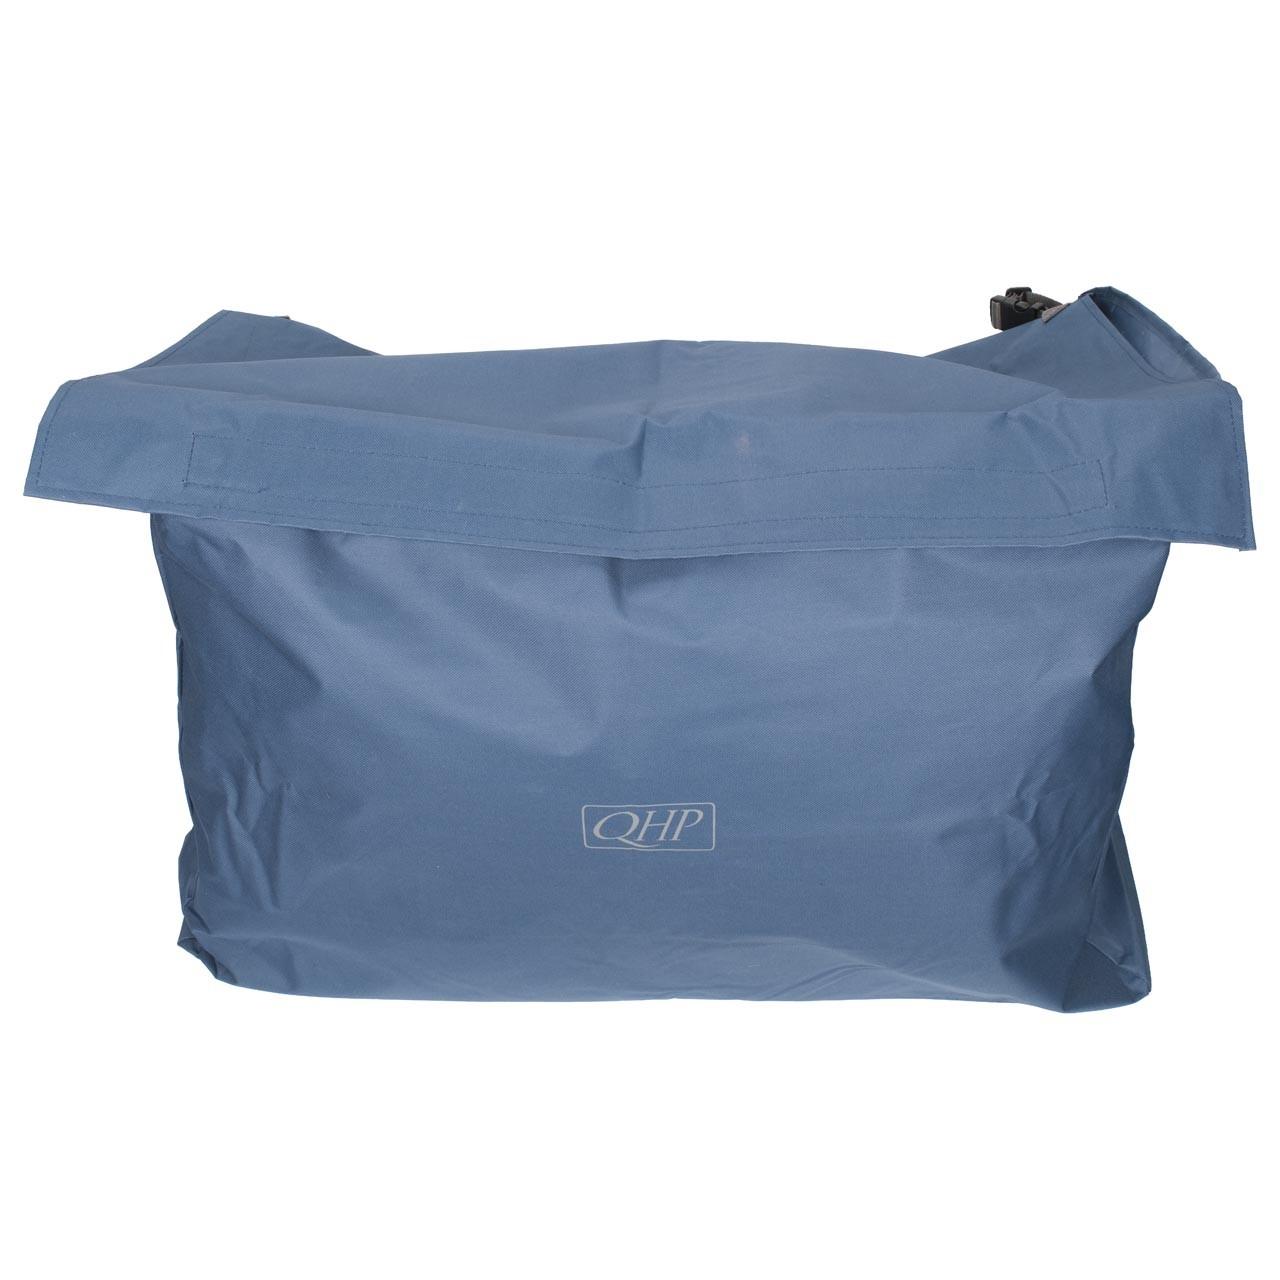 QHP stal tas donkerblauw